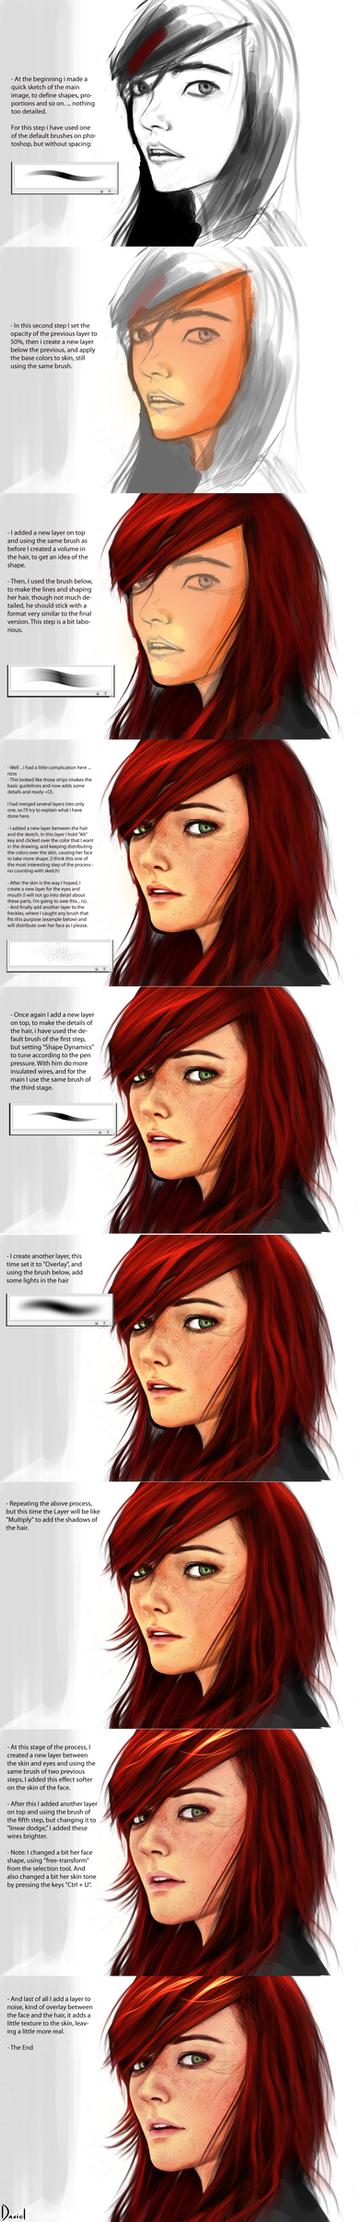 Redhead - Steps by DanOliveira